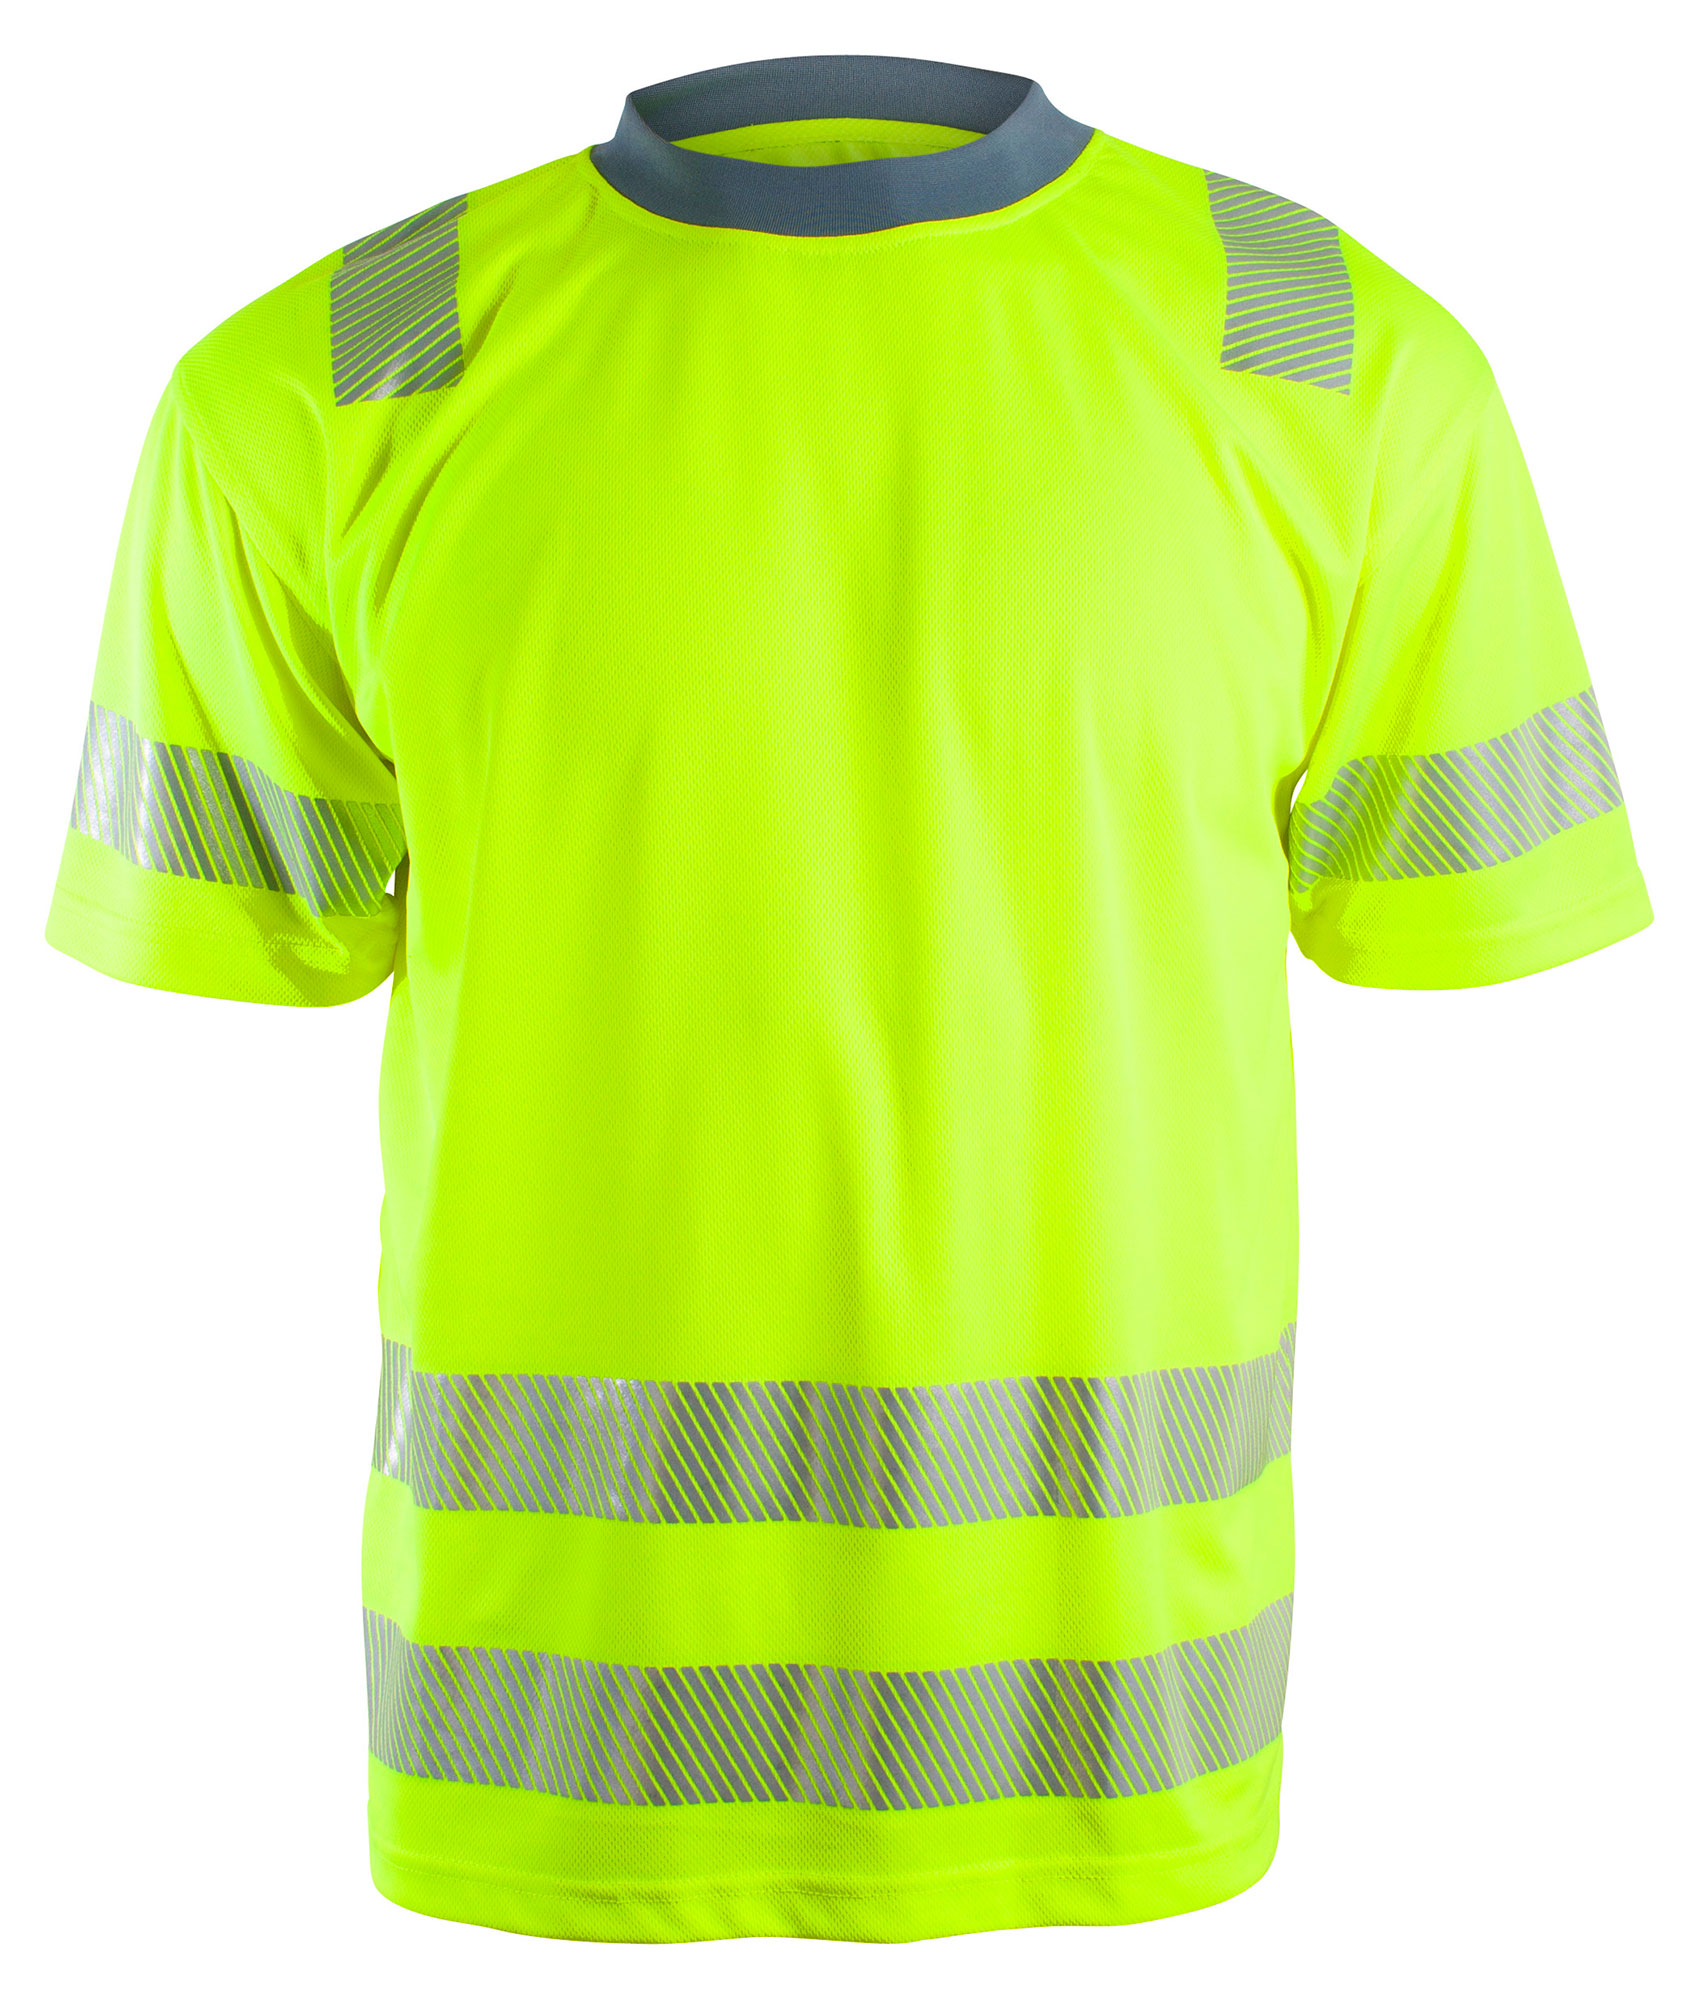 T-Shirt EN 471